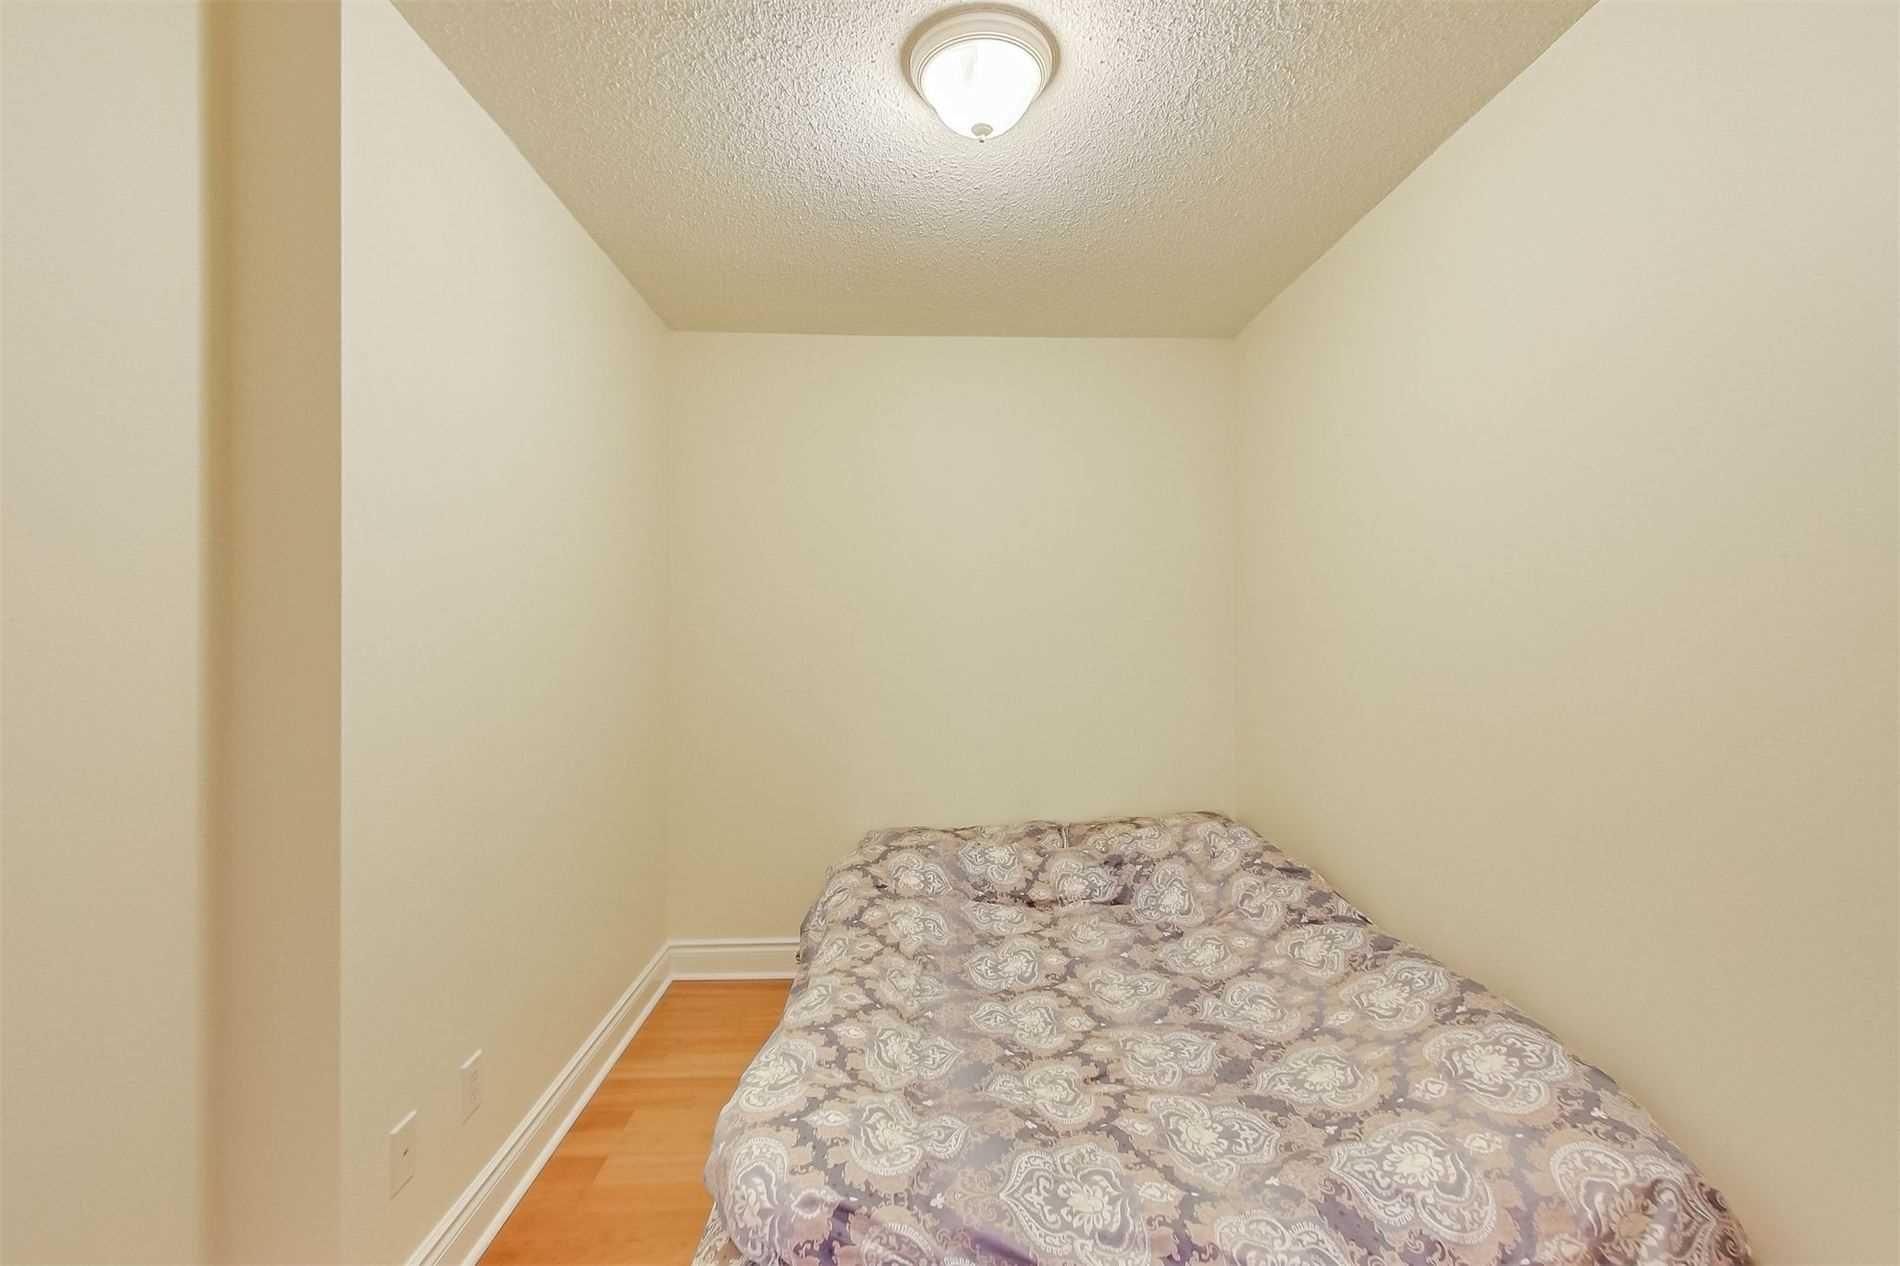 Photo 15: Photos: 1204 10 Northtown Way in Toronto: Willowdale East Condo for sale (Toronto C14)  : MLS®# C4648371